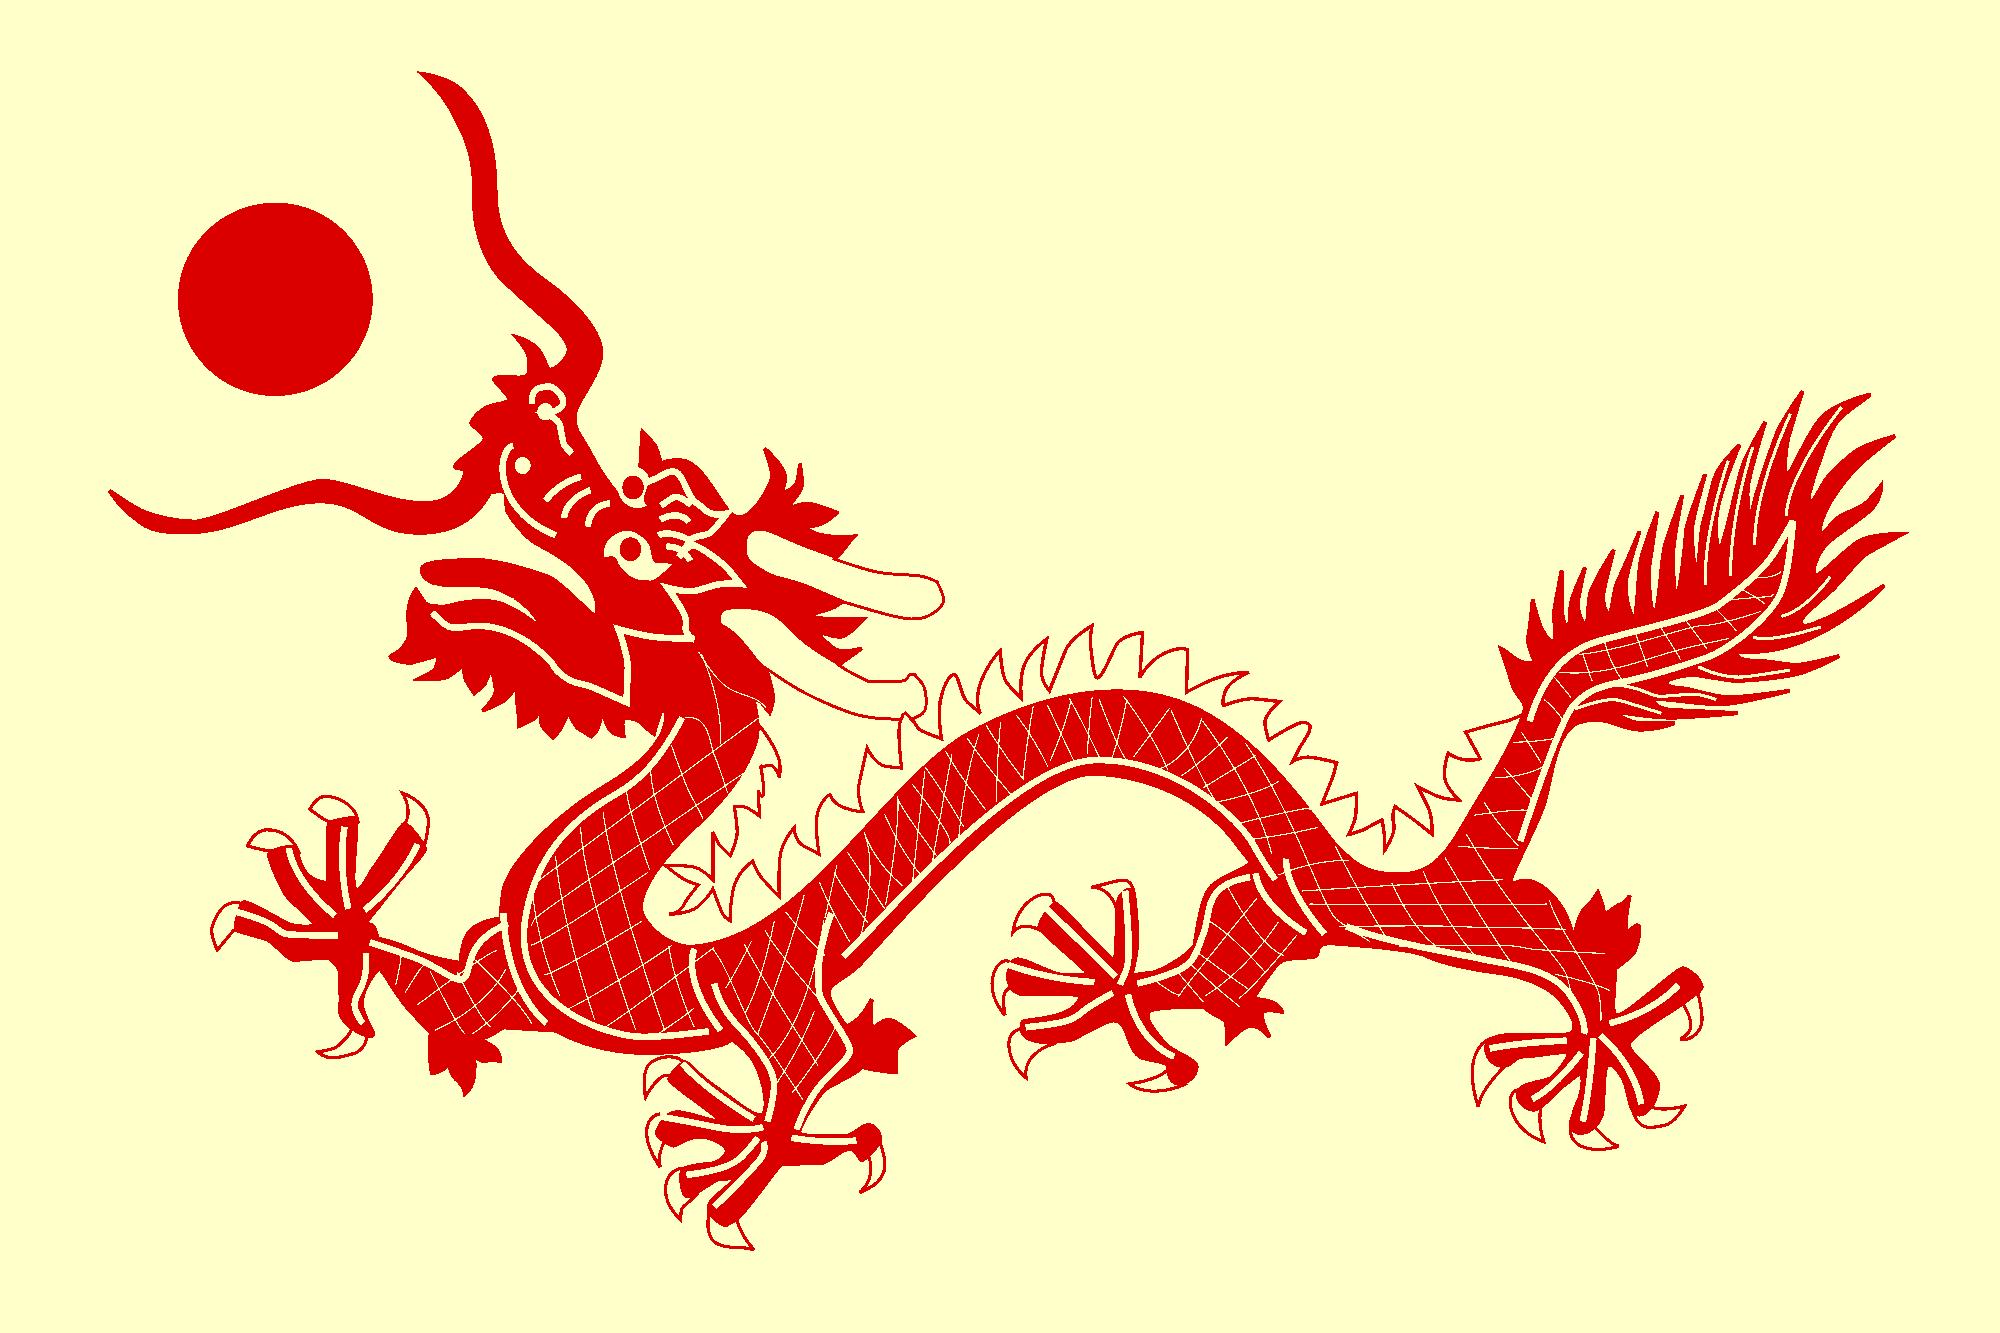 4 tips for memorizing chinese characters language trainers usa blog proposedreunifiedchineseflag buycottarizona